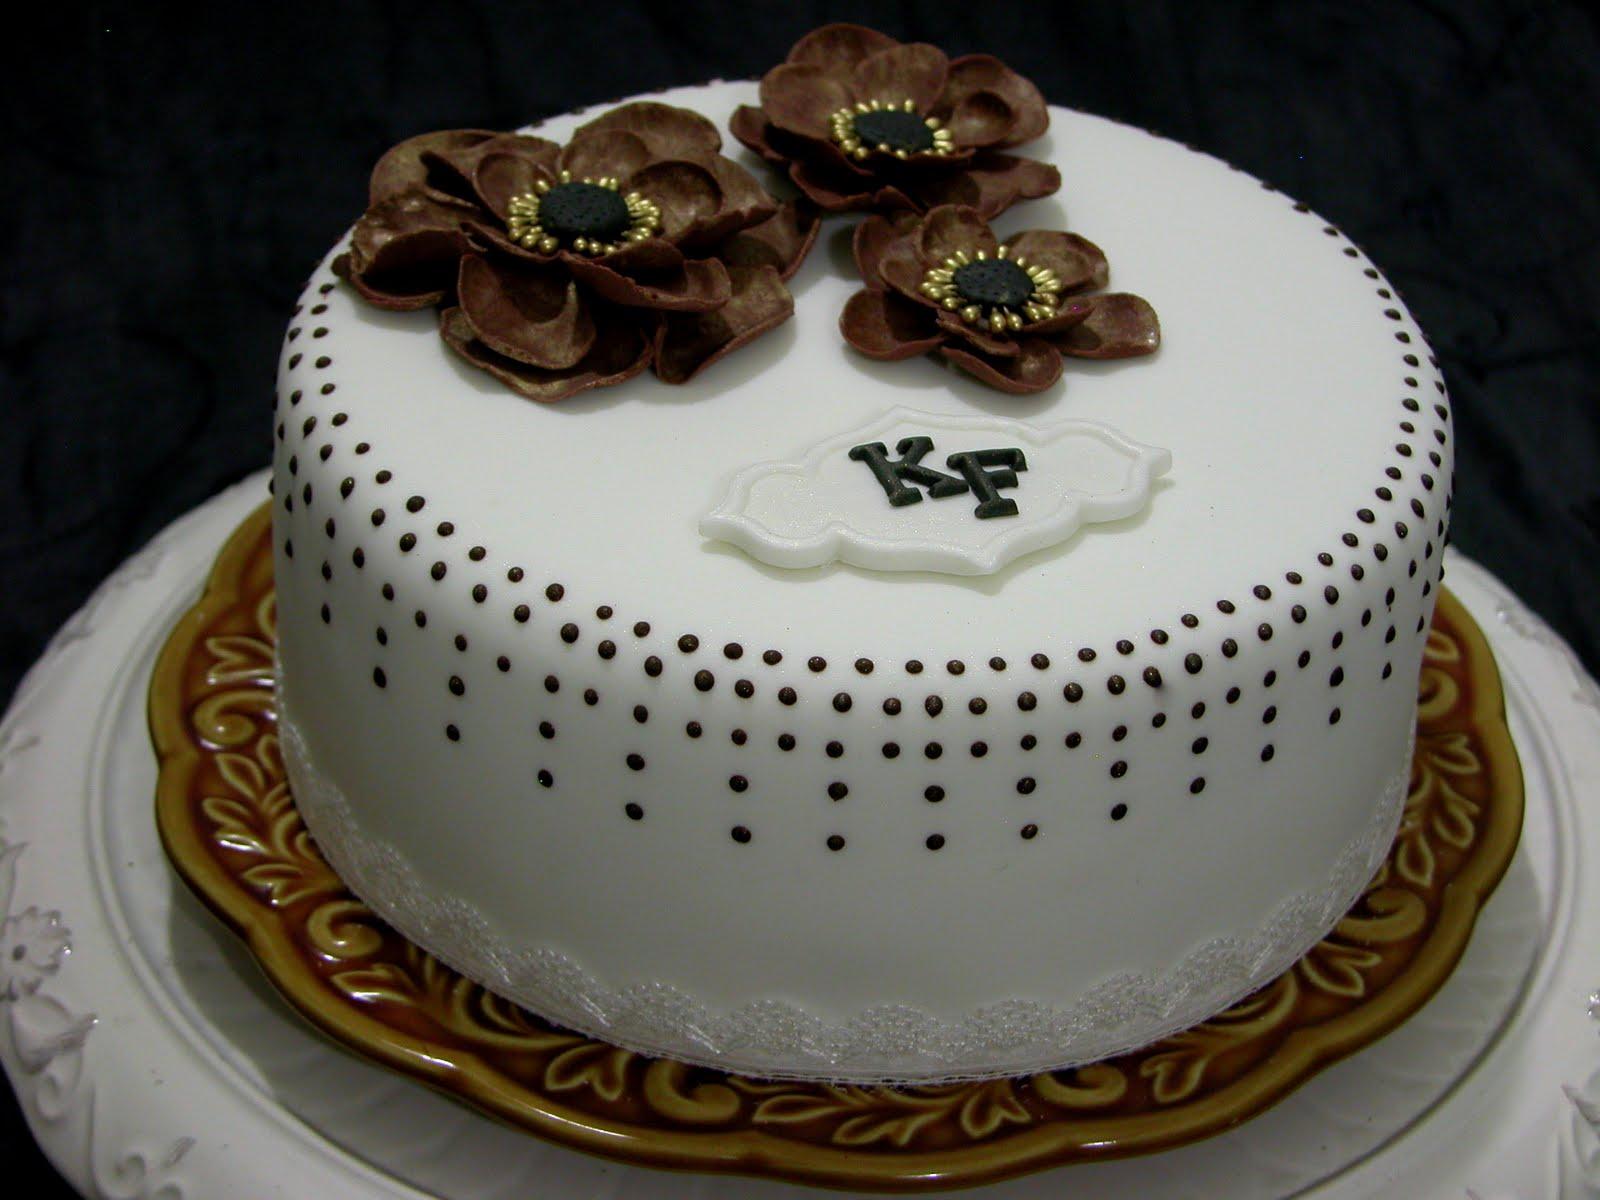 http://3.bp.blogspot.com/_zeC5H6adHVw/TDGyfG_T9LI/AAAAAAAABG0/PqIqroAVMBQ/s1600/polka%2Bdots.jpg